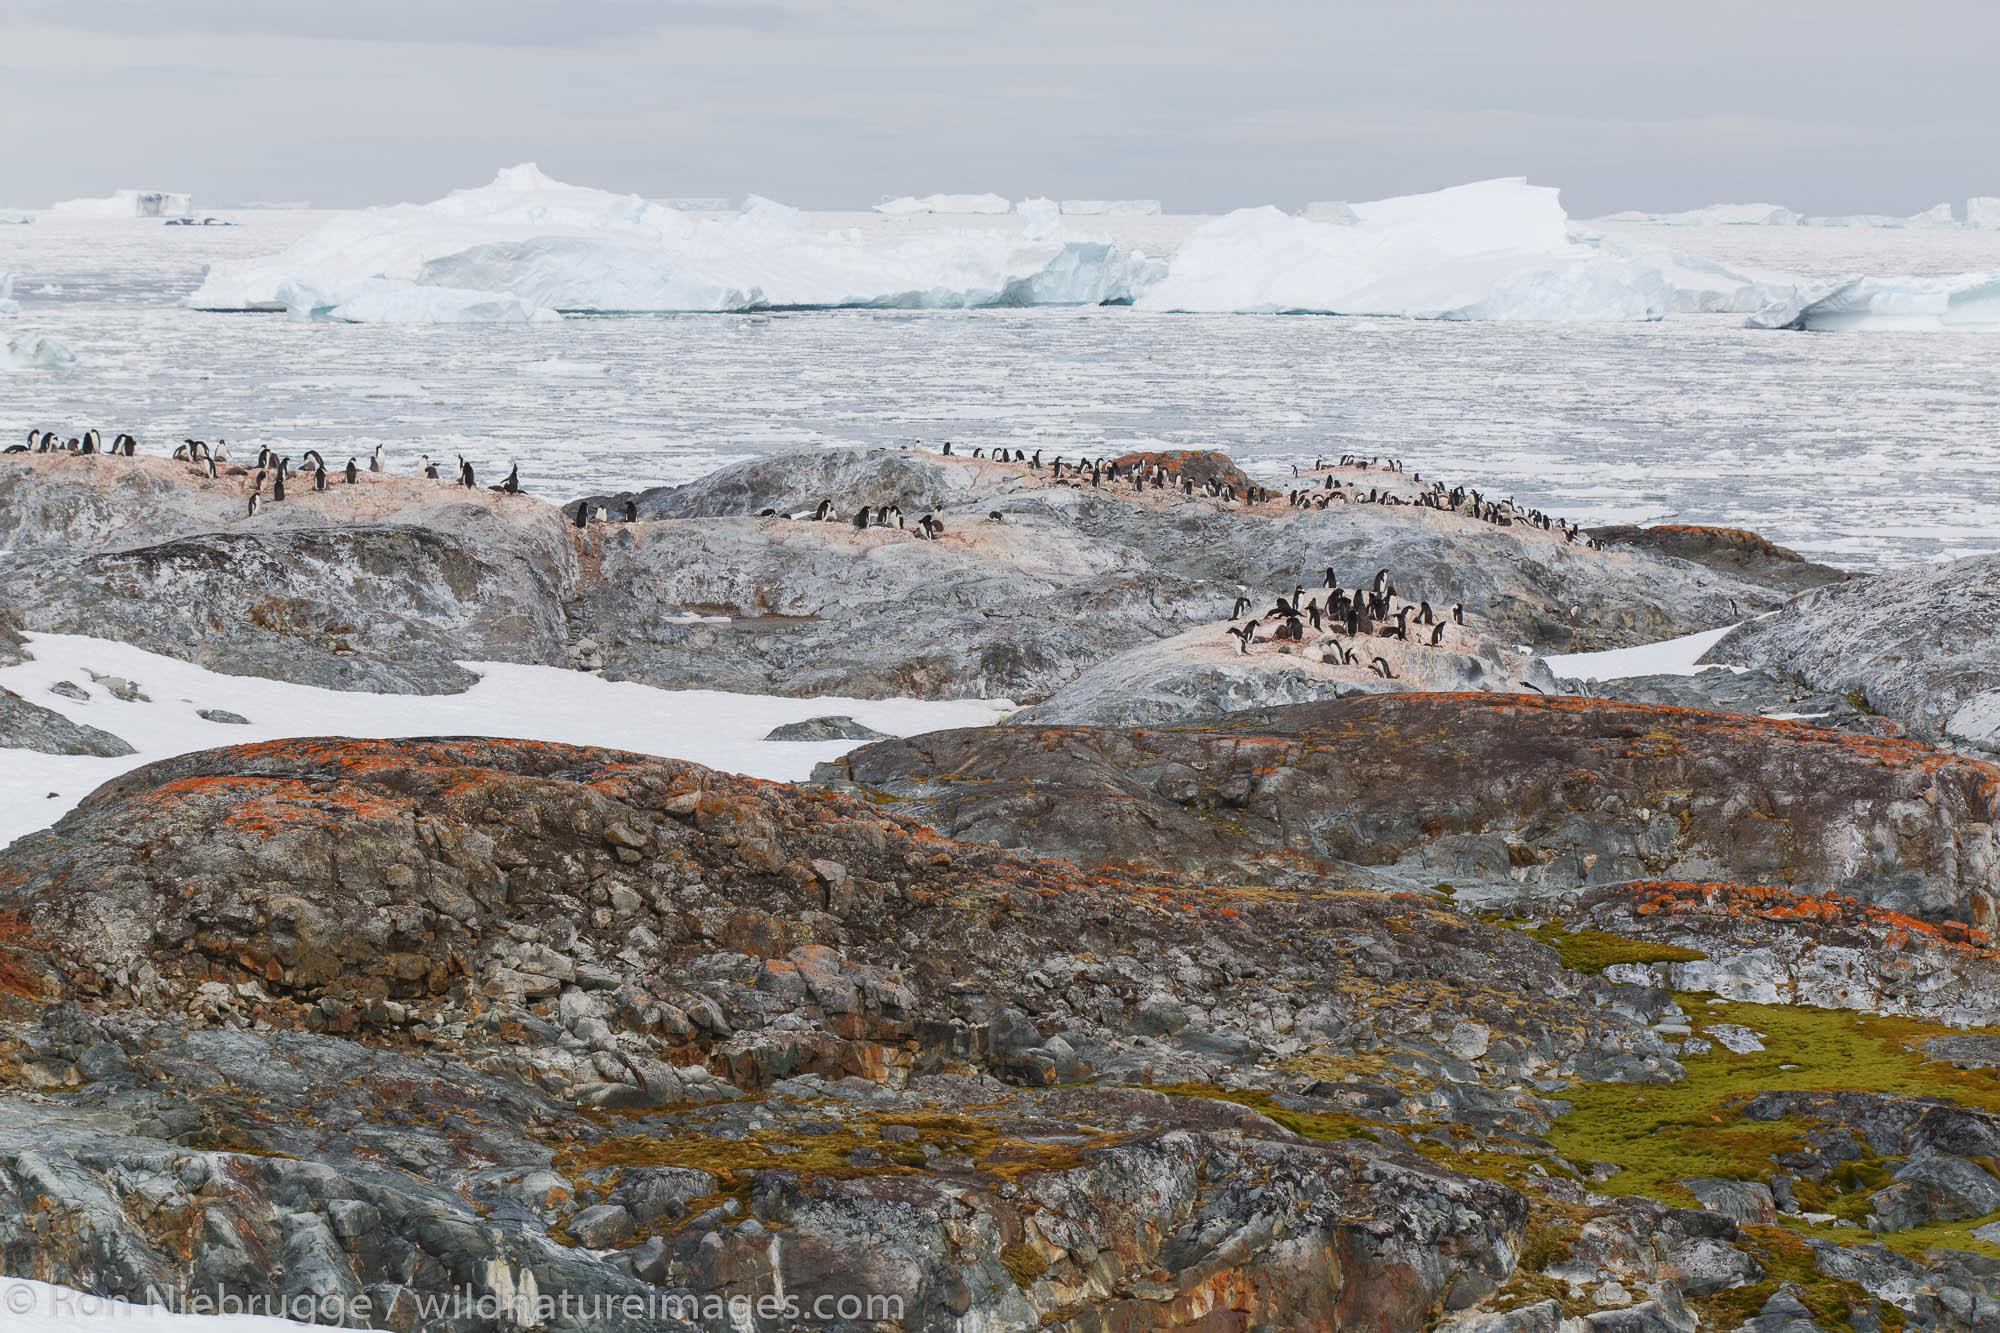 Adélie penguin (Pygoscelis adeliae) colony on Yalour Island, Antarctica.